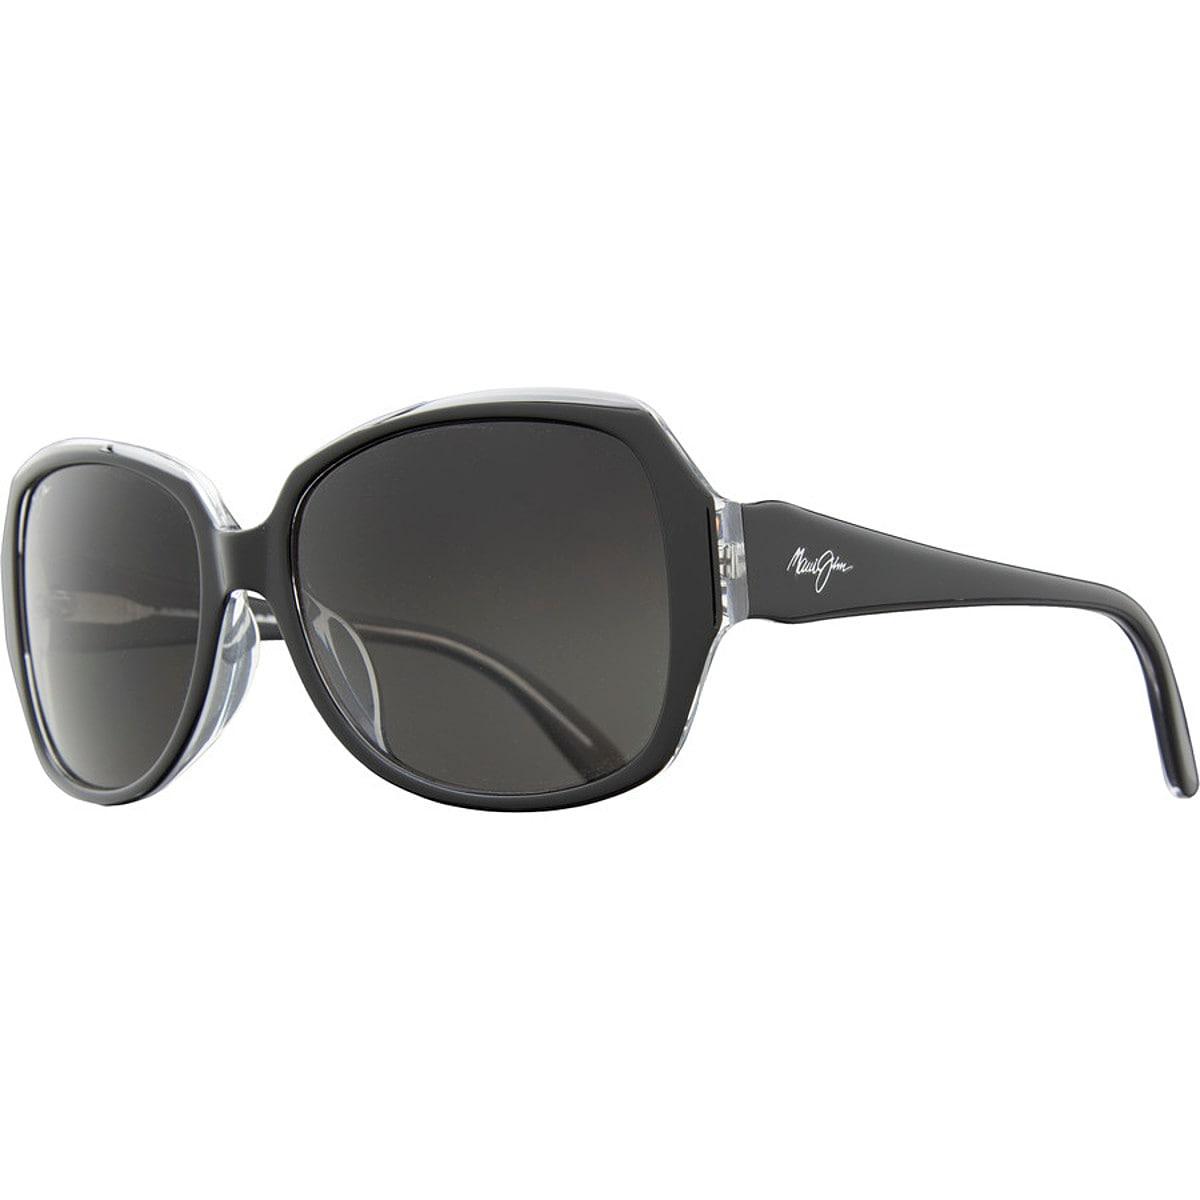 Maui Jim Kalena Sunglasses - Women's | eBay